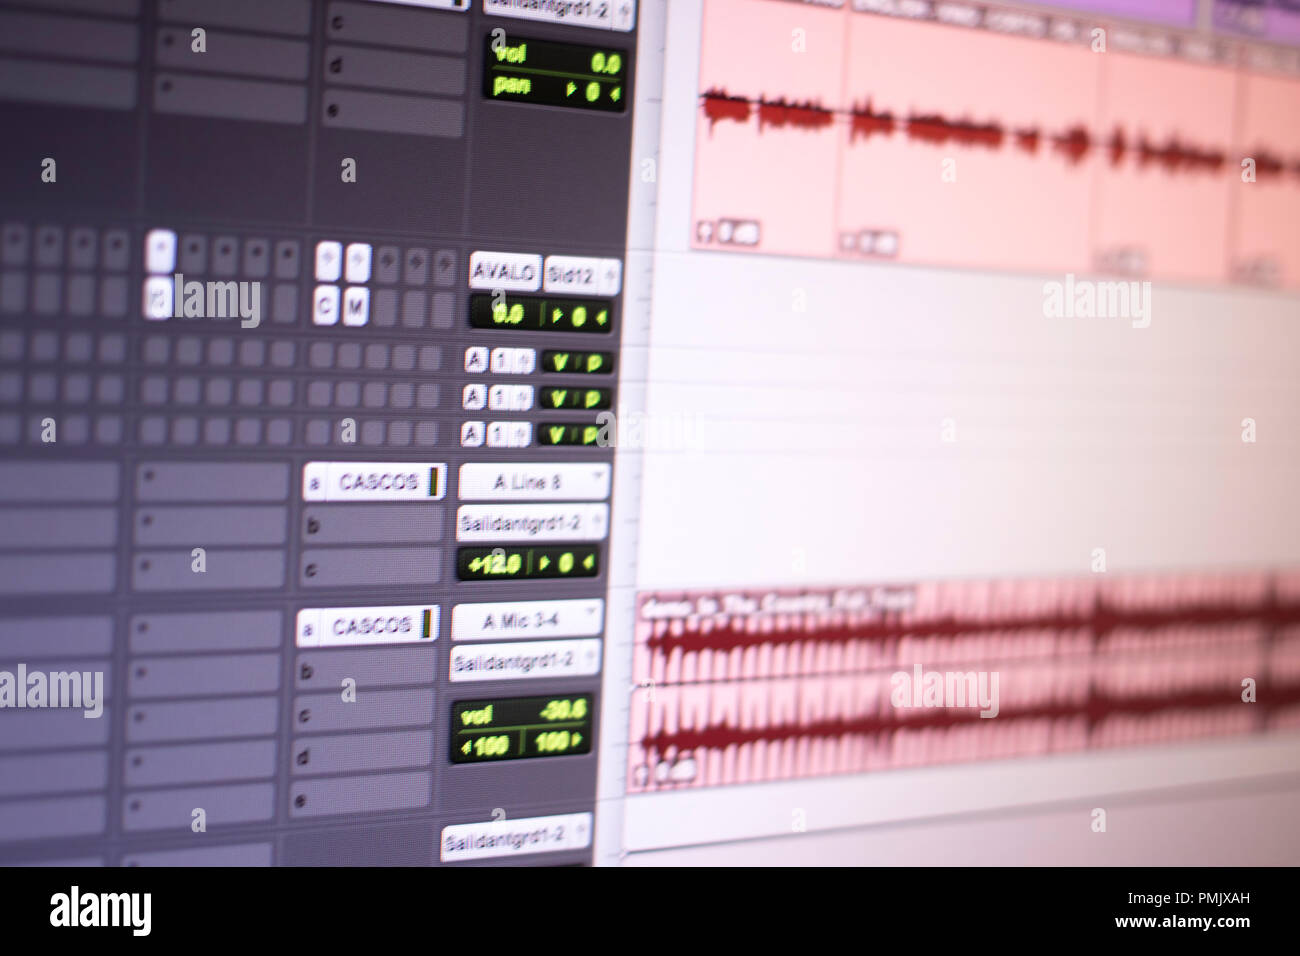 Recording audio studio mixing computer screen program to